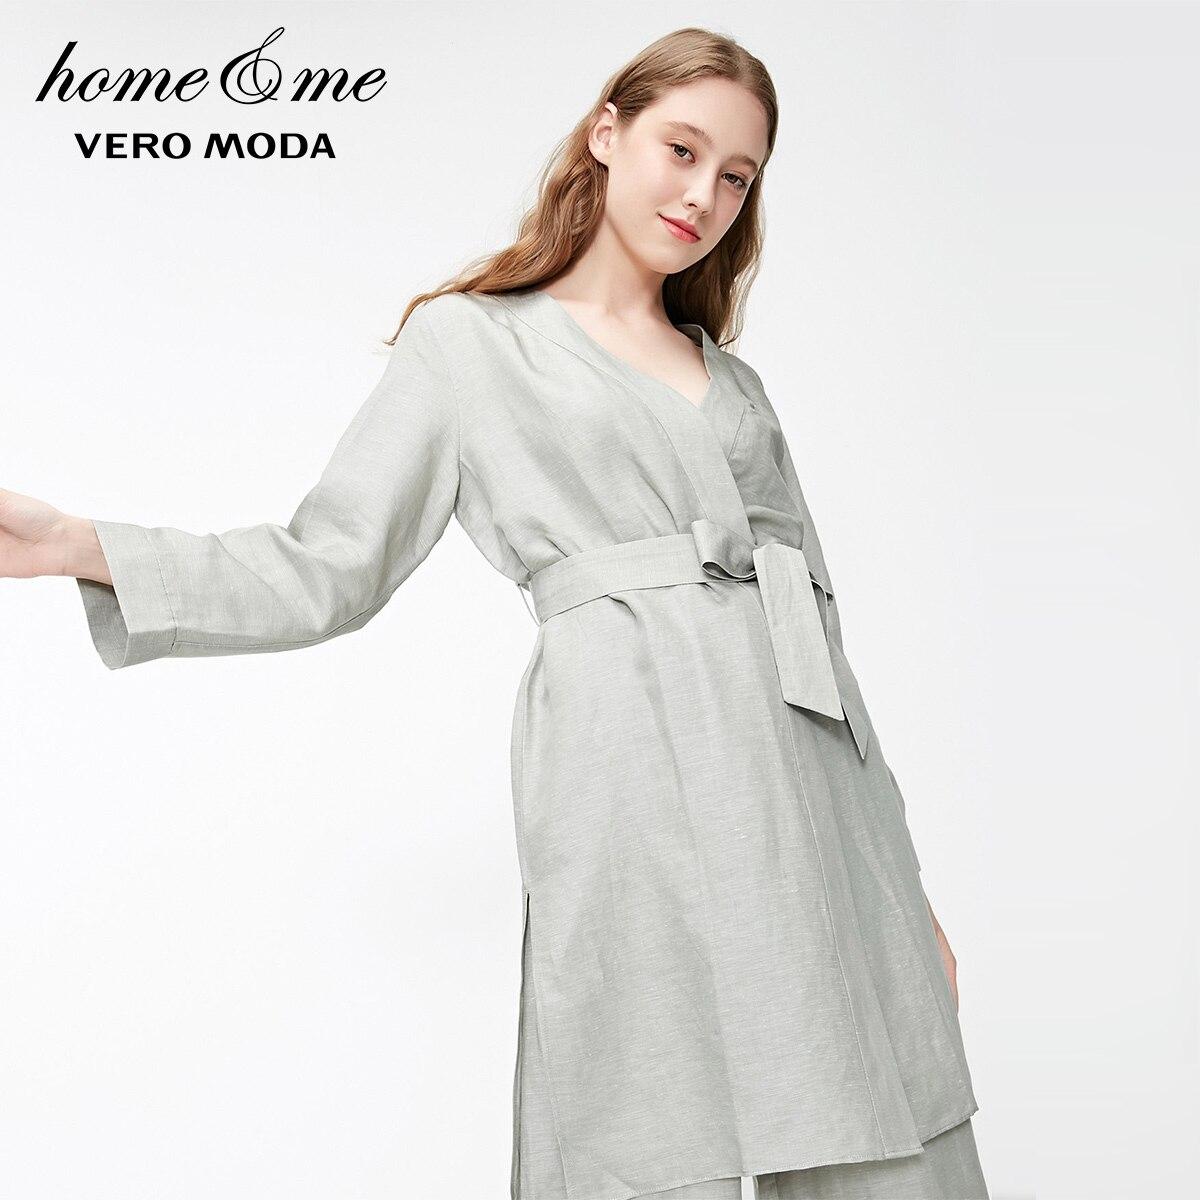 Vero Moda Women S Simple Linen Lace Up Lounge Wear Night Robe 3192r1504 Robes Aliexpress